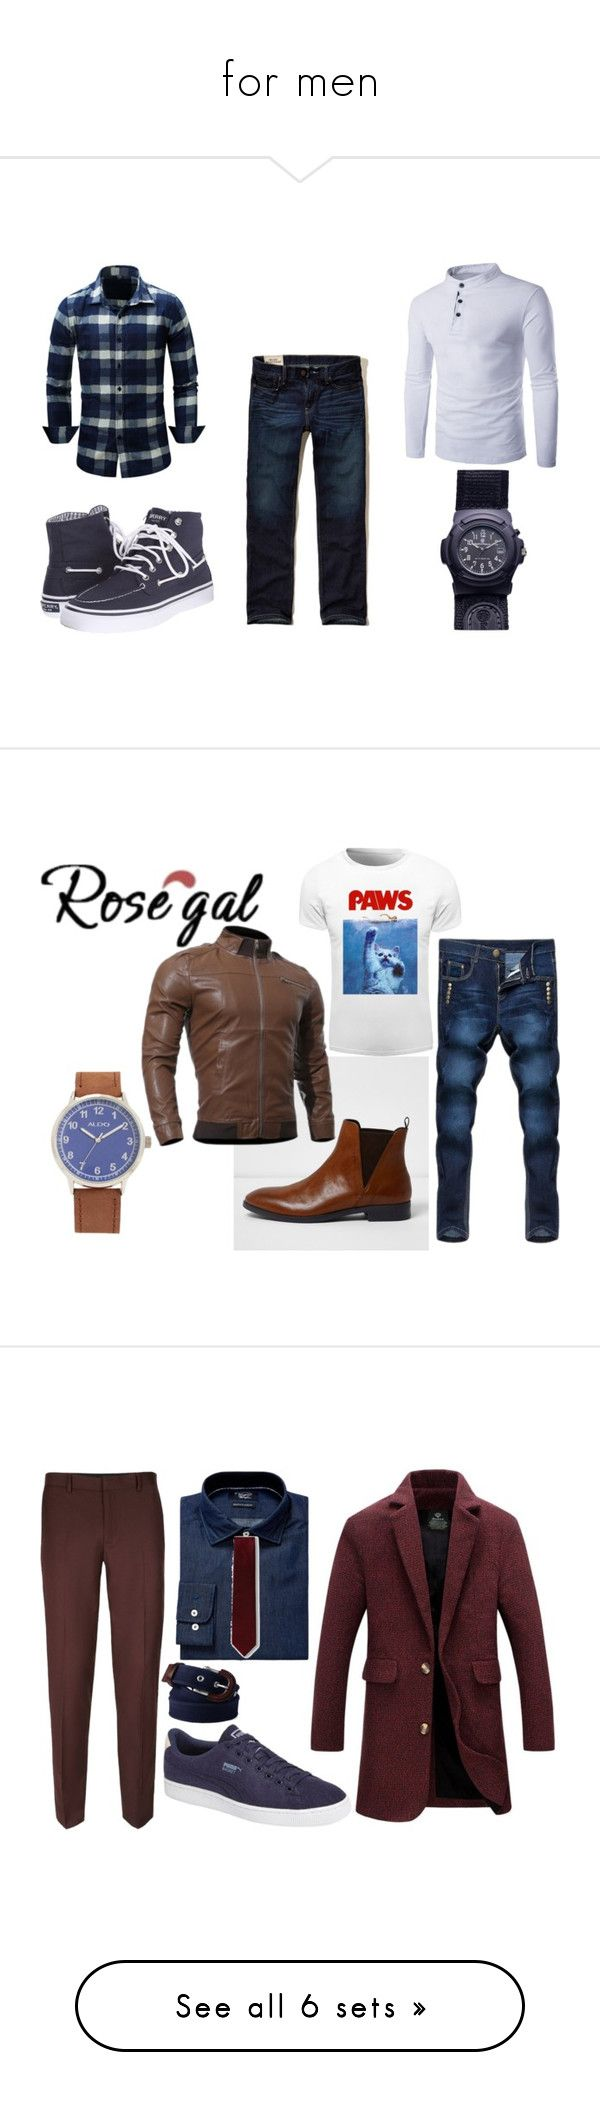 """for men"" by ilona-giladi ❤ liked on Polyvore featuring MensFashion, Hollister Co., Sperry, men's fashion, menswear, River Island, ALDO, Topman, Original Penguin and Puma"